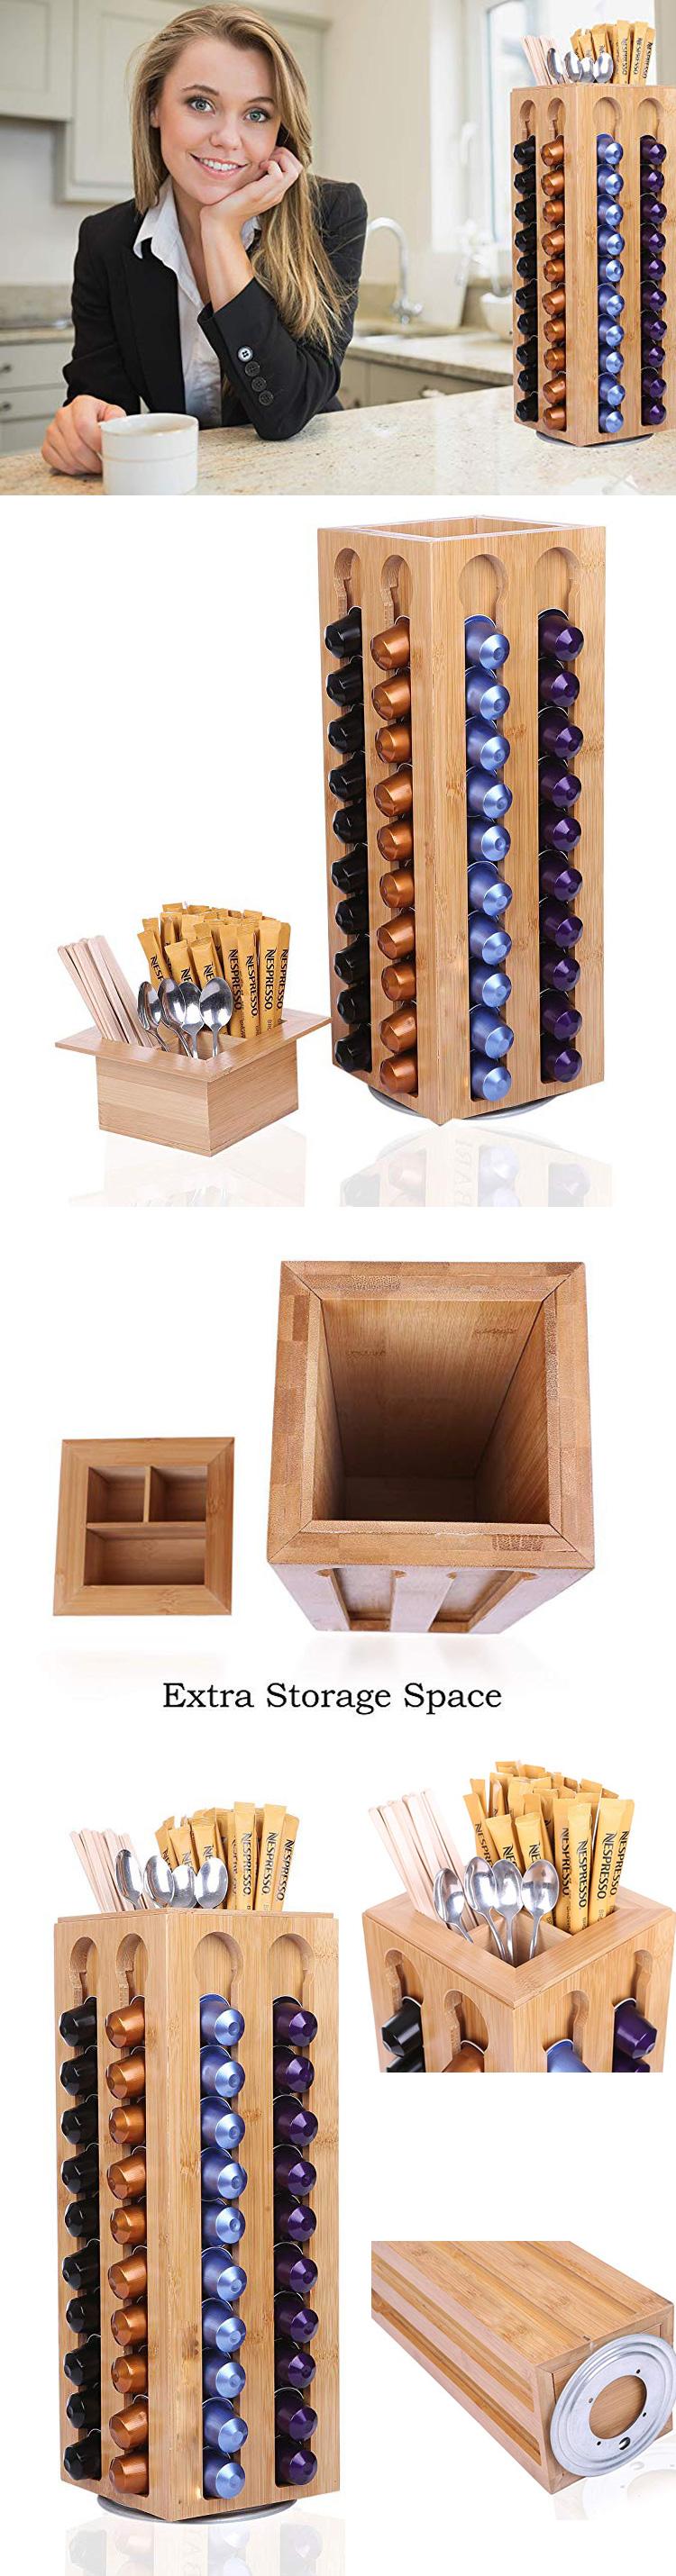 Bamboo Coffee Capsules Pod Holder Carousel Holds Coffee Capsules Storage Organizer